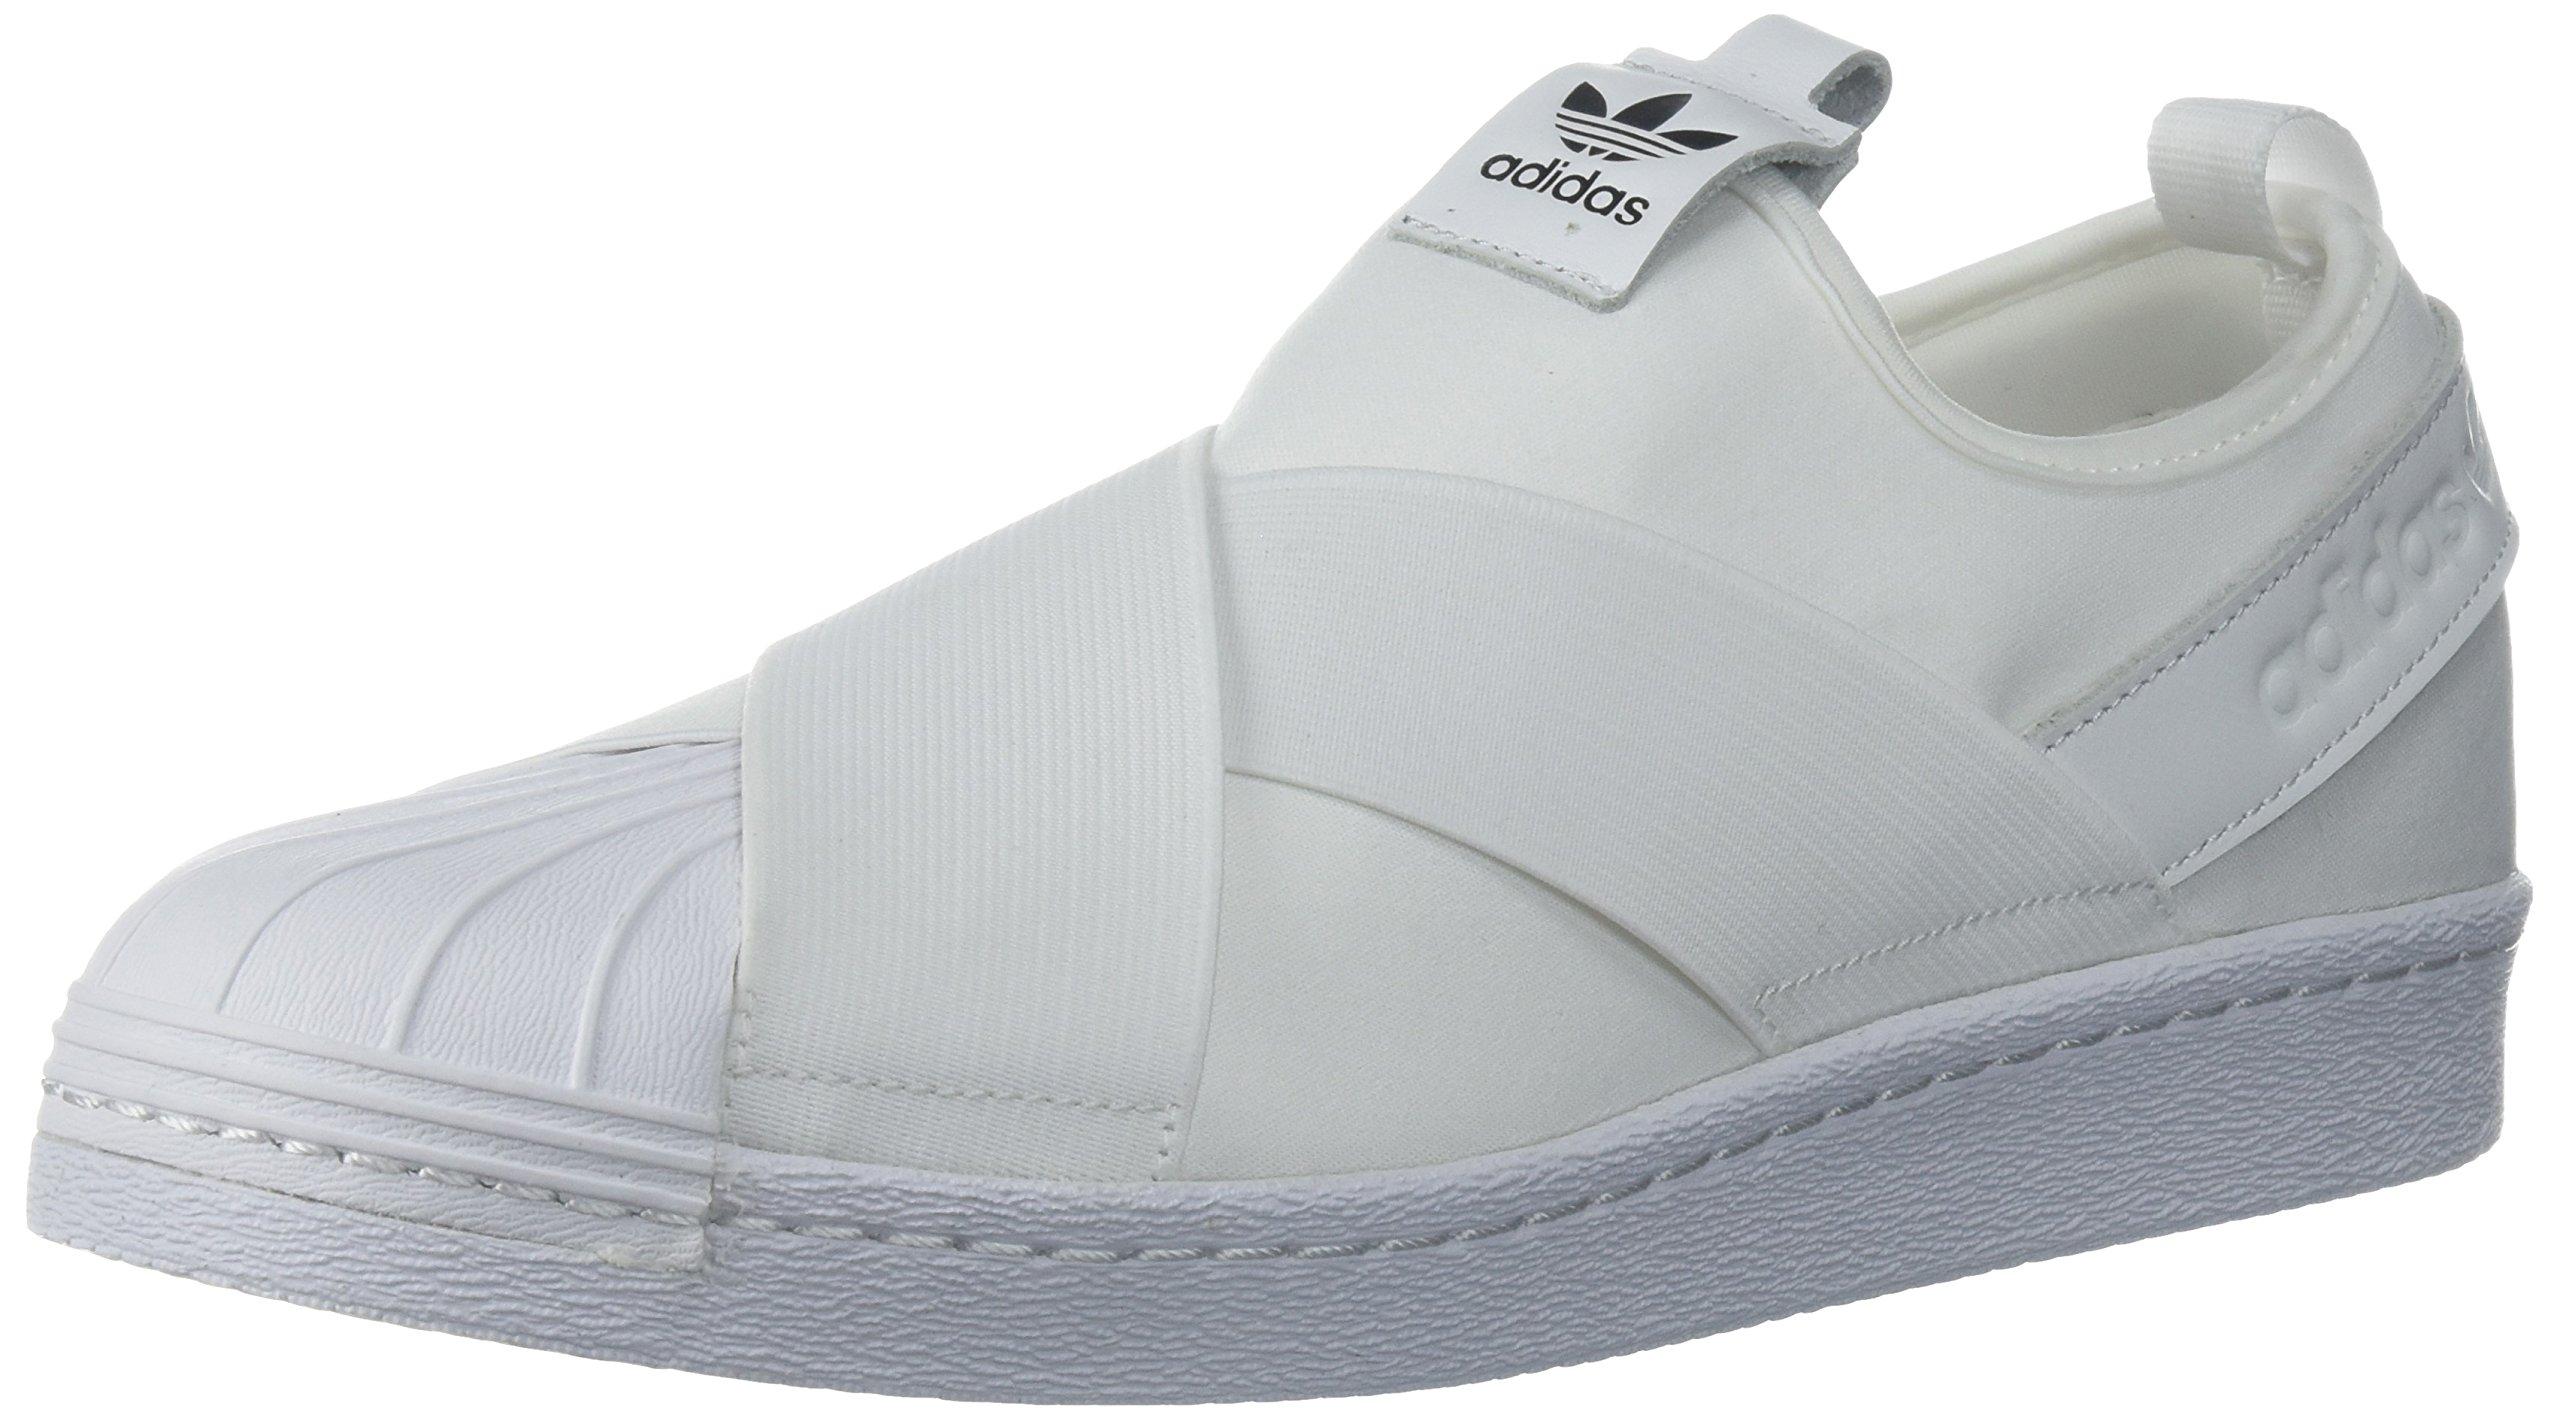 09626a773f Galleon - Adidas Originals Women s Superstar Slipon W Sneaker Running Shoe